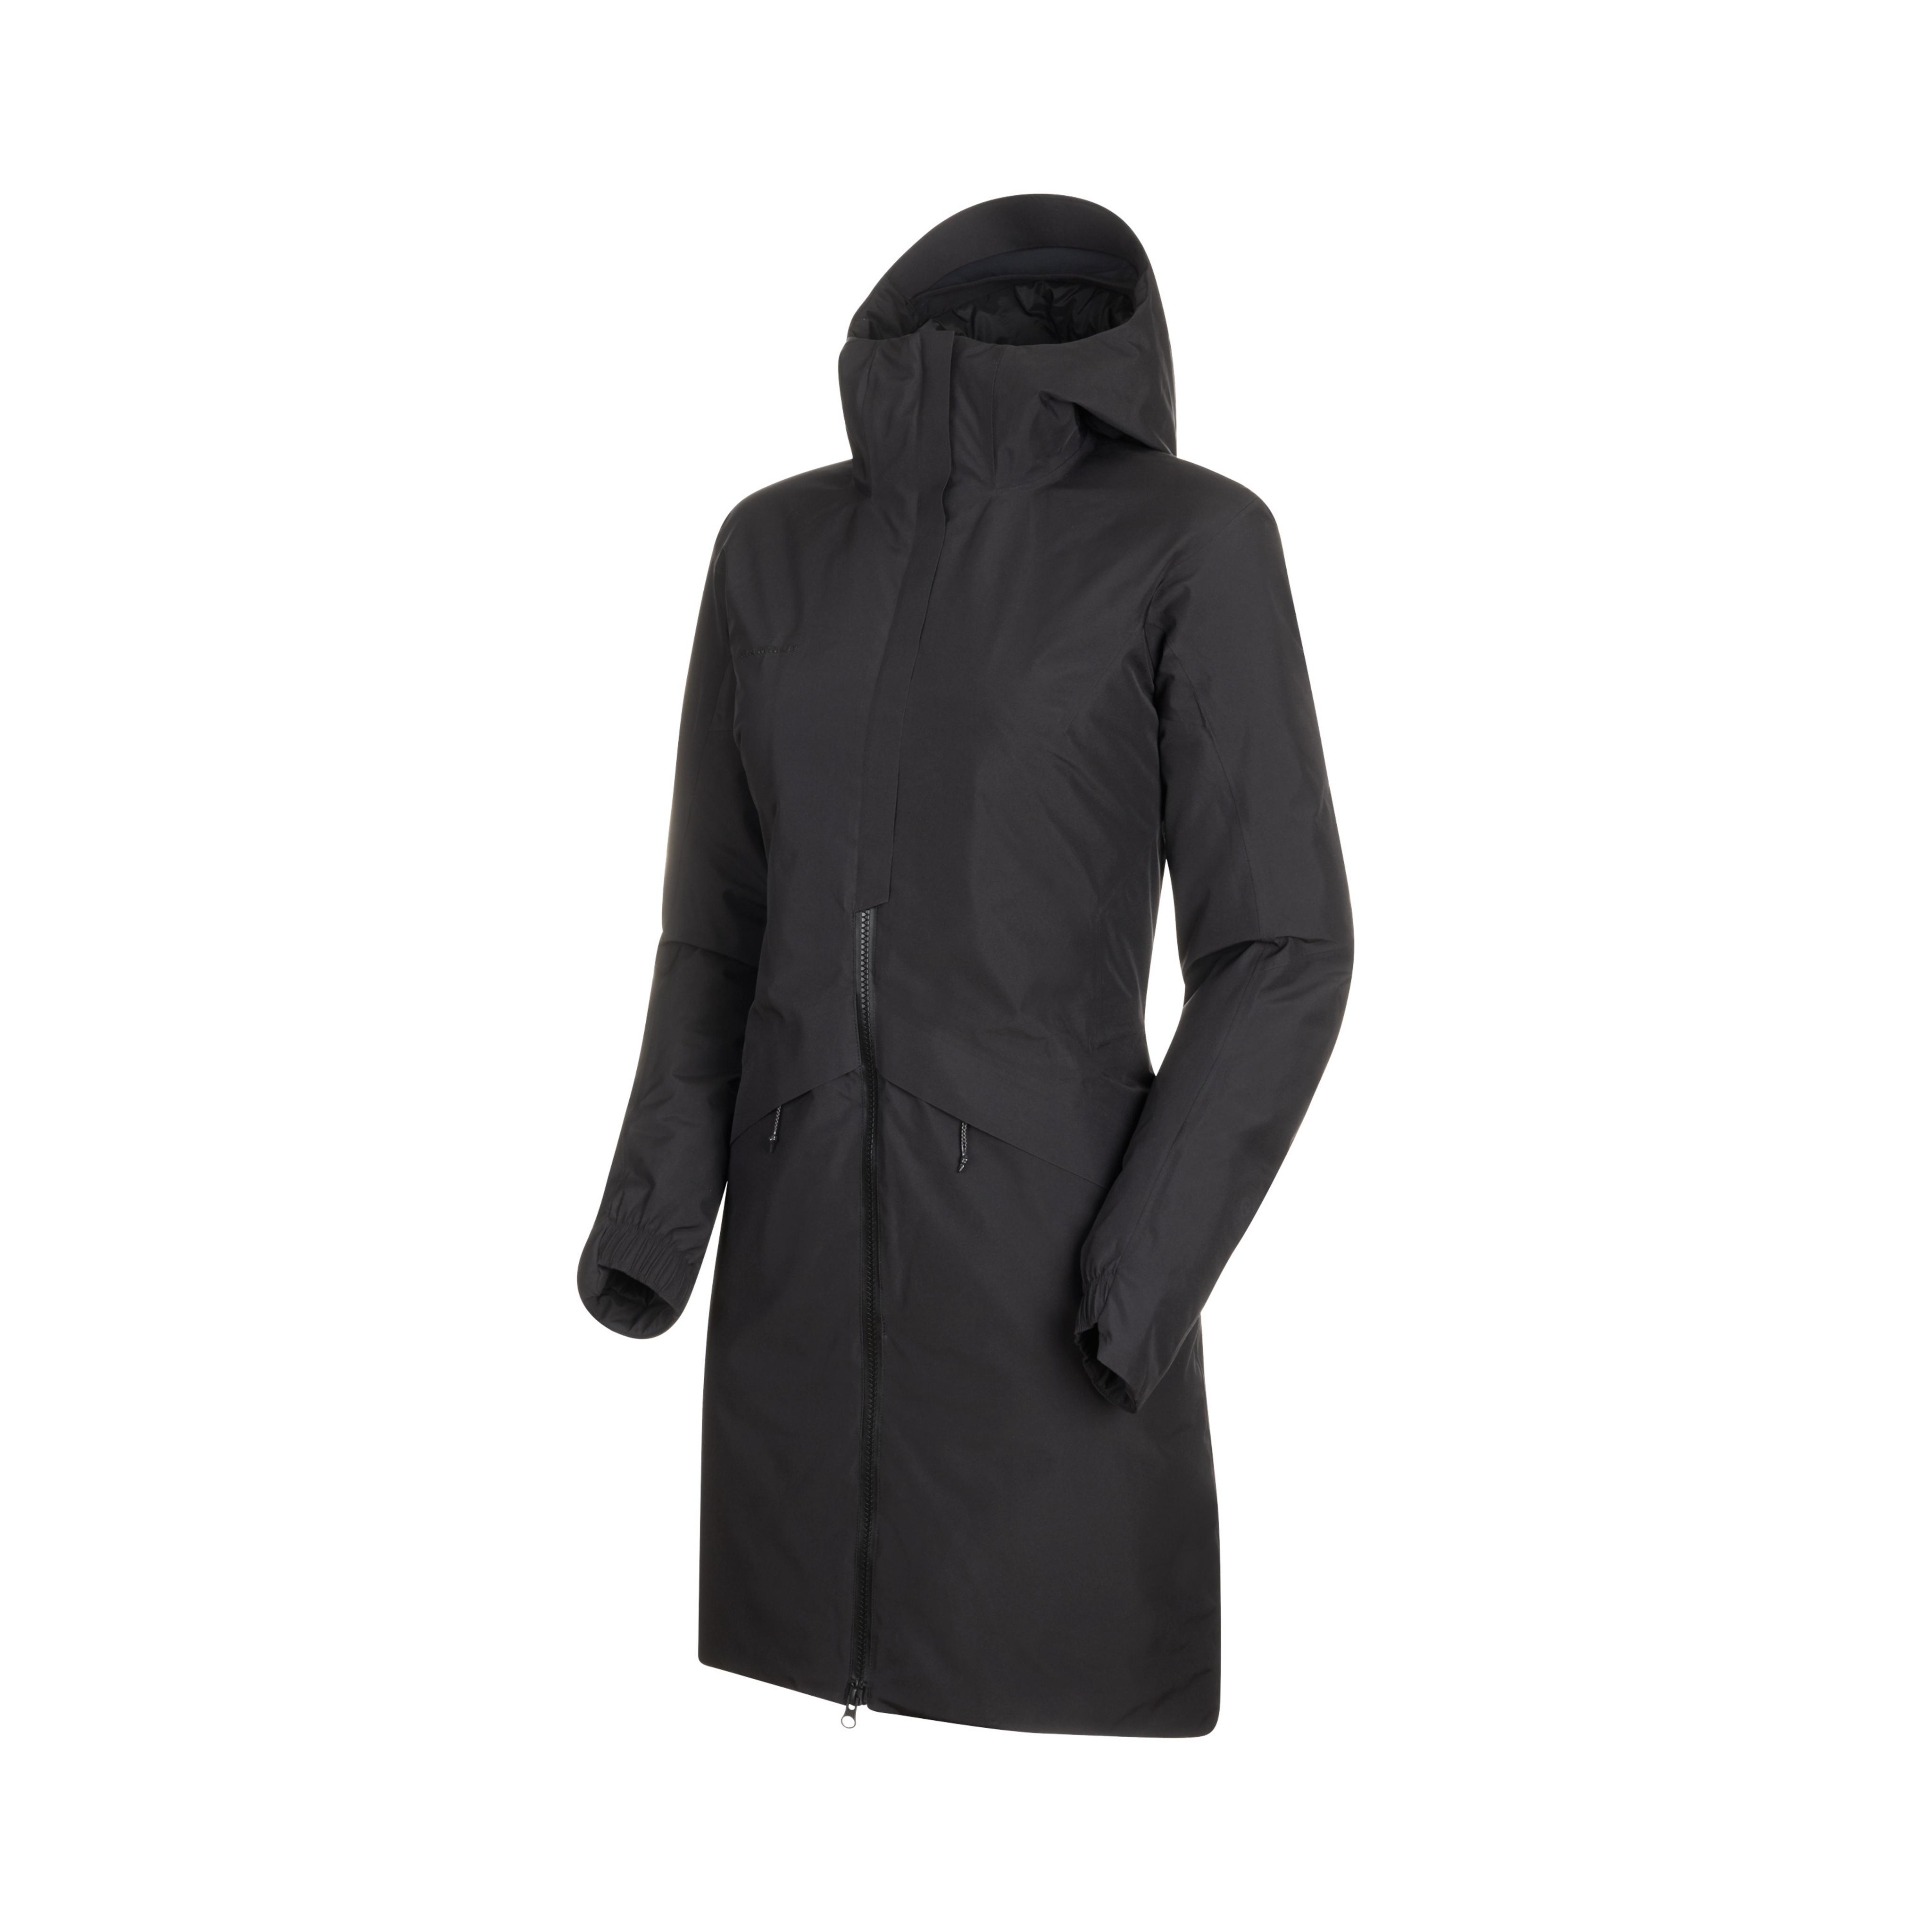 3379 HS Thermo Hooded Coat Women - black, XS thumbnail